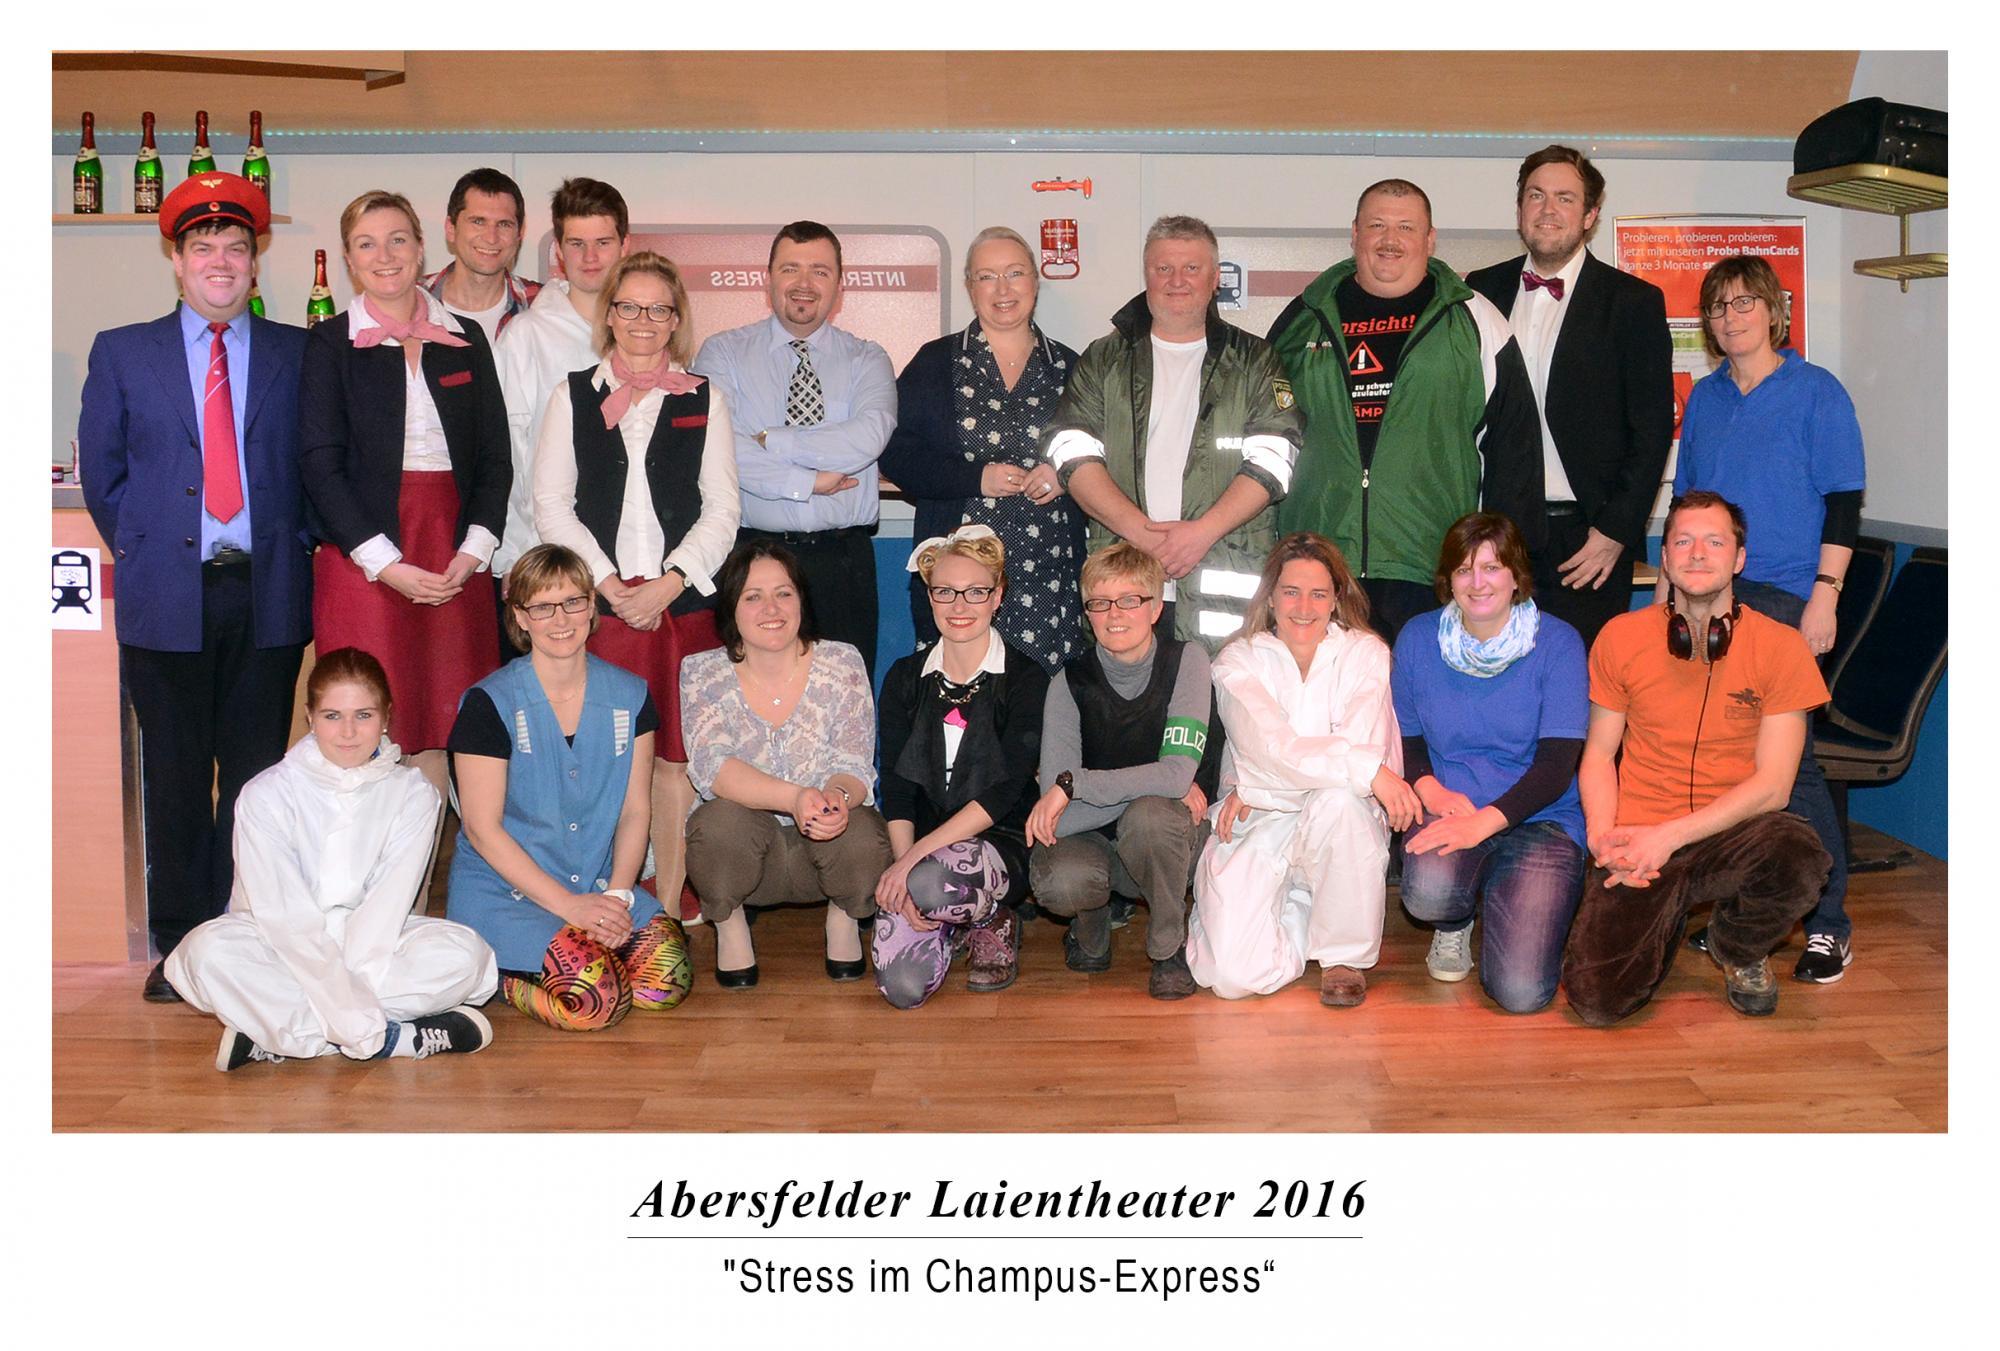 Abersfelder Laientheater 2016web.jpg